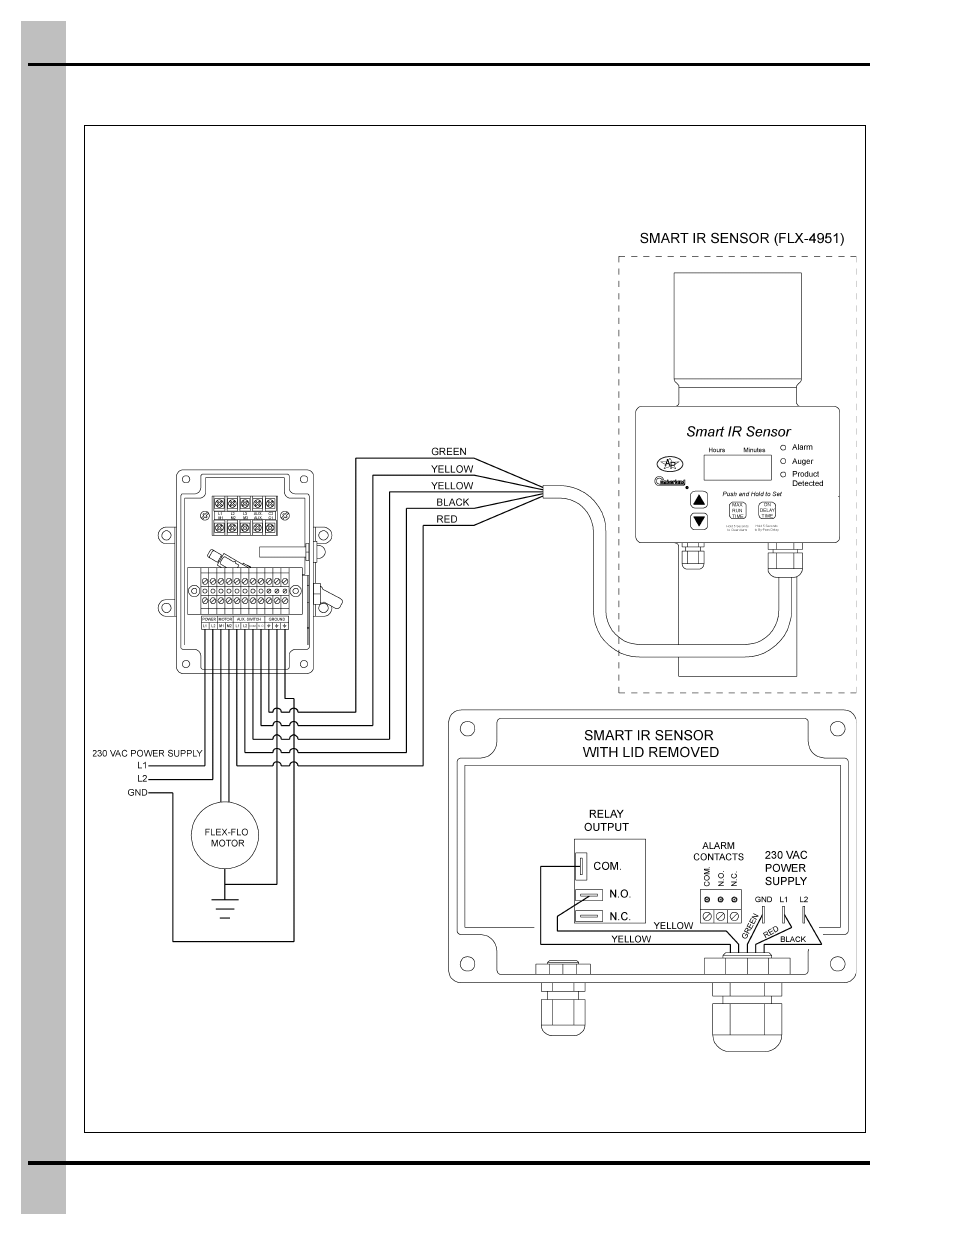 Flex Flo Control With Smart Ir Sensor Flx 4951 Grain Systems Bin Infrared Controls Wiring Diagram Accessories Pneg 914 User Manual Page 62 64